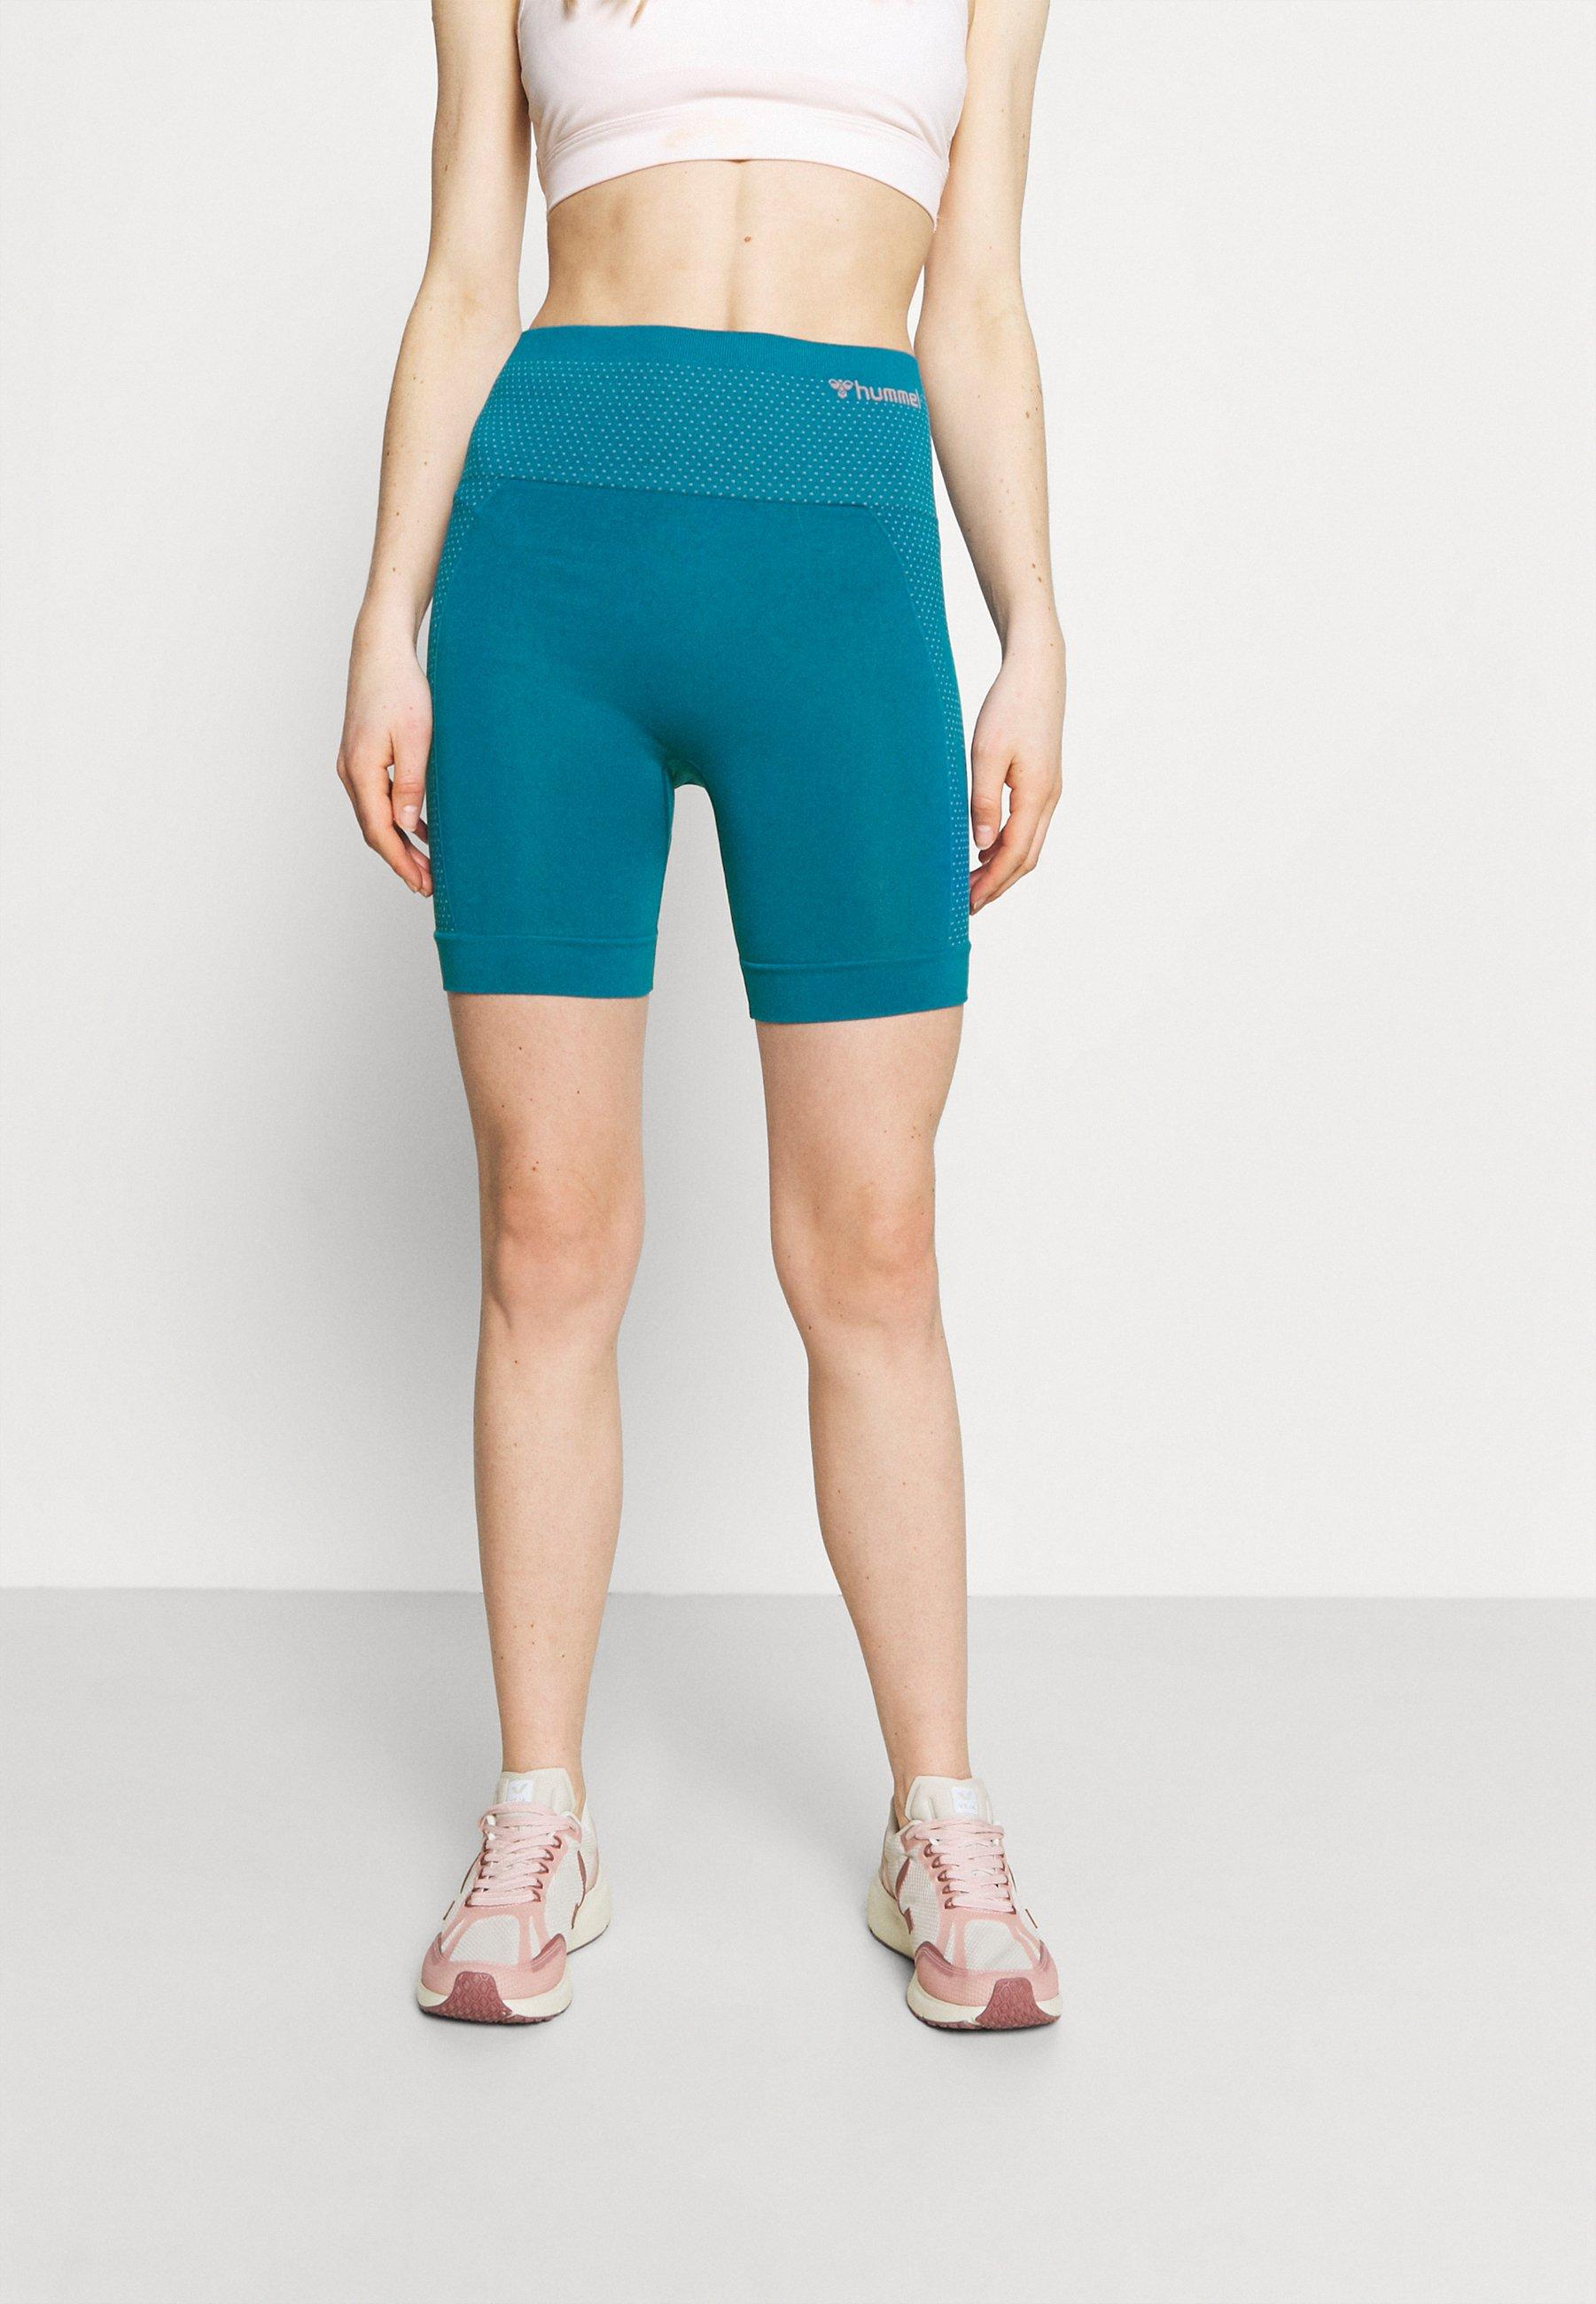 Femme HMLFELICITY SEAMLESS SHORTS - Collants